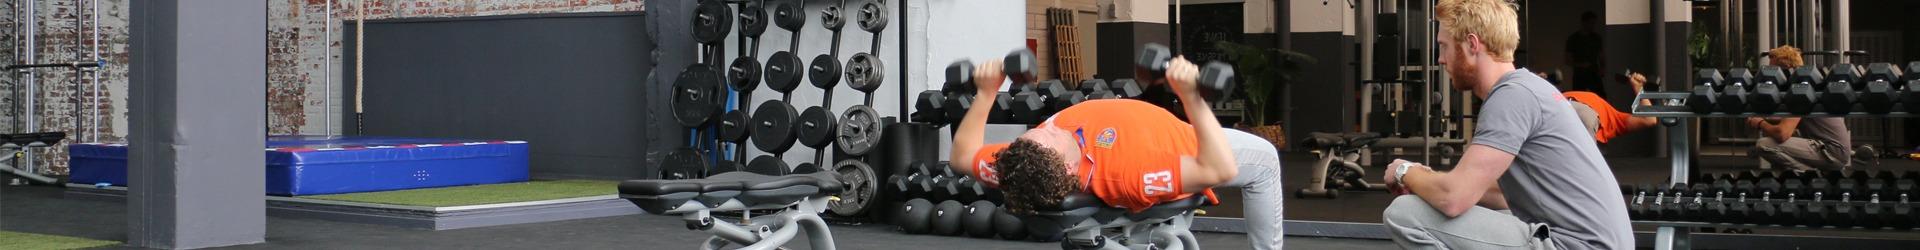 personal training tilburg